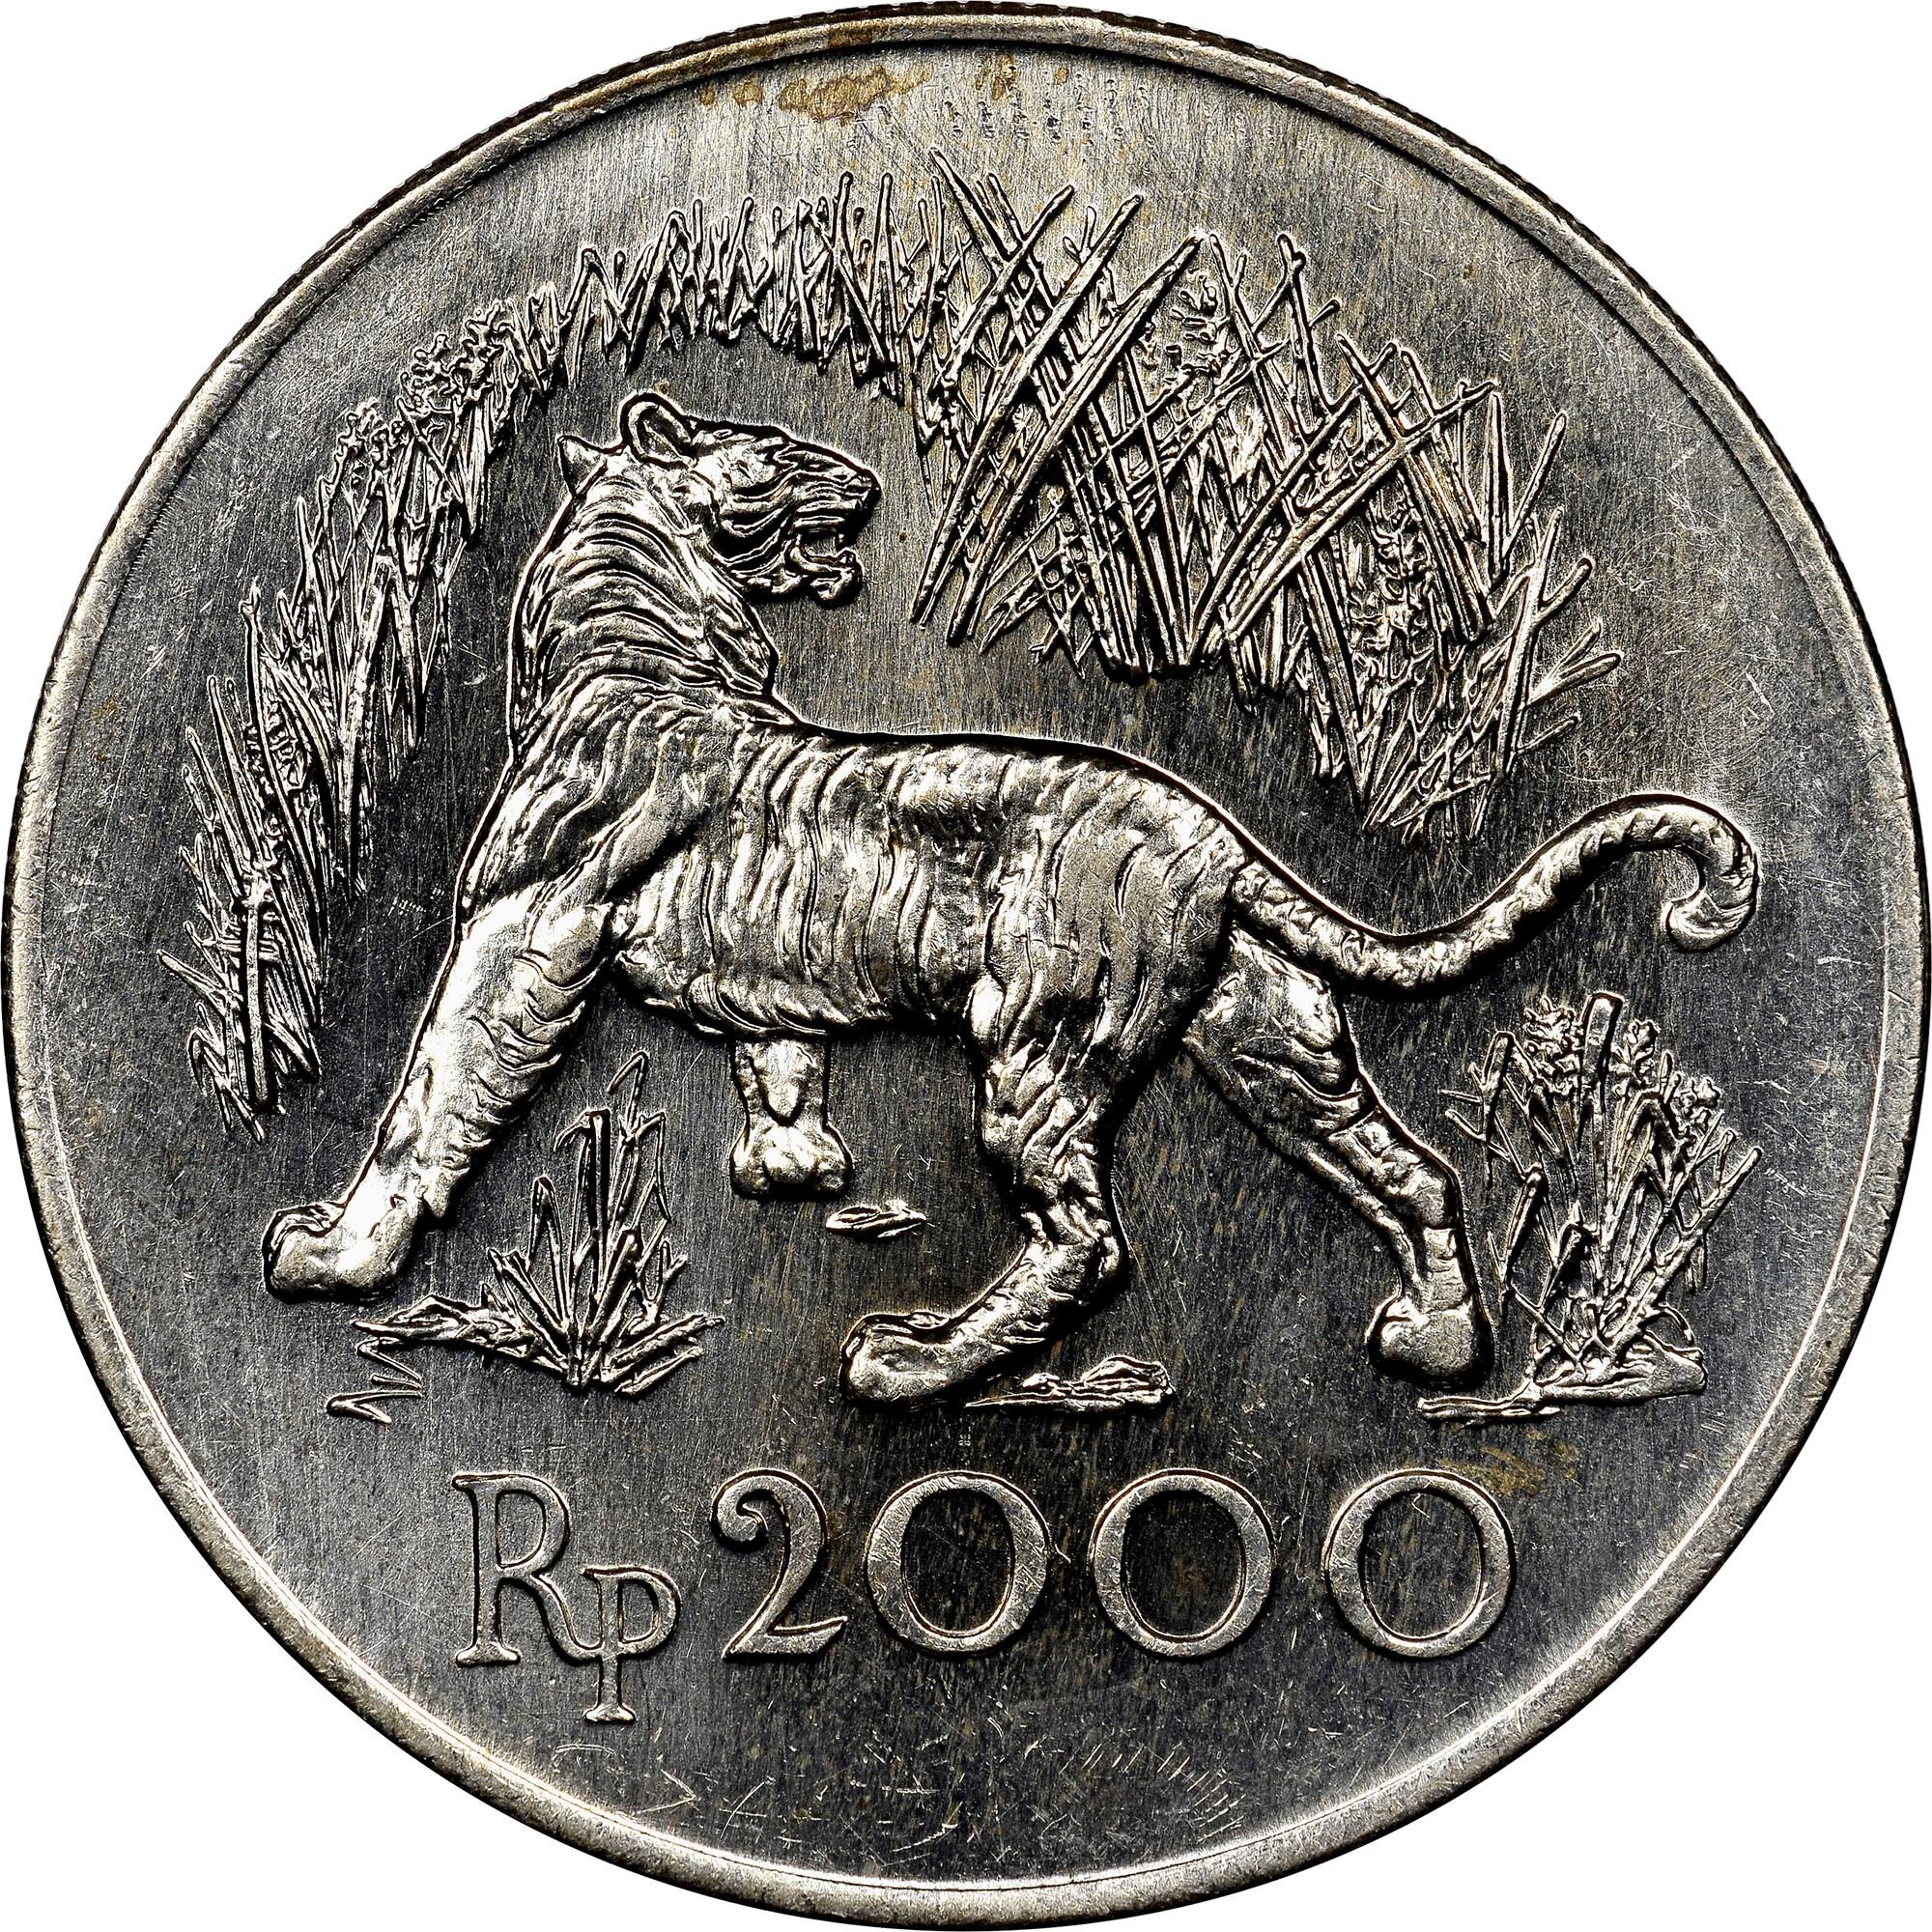 Indonesia 2000 Rupiah reverse